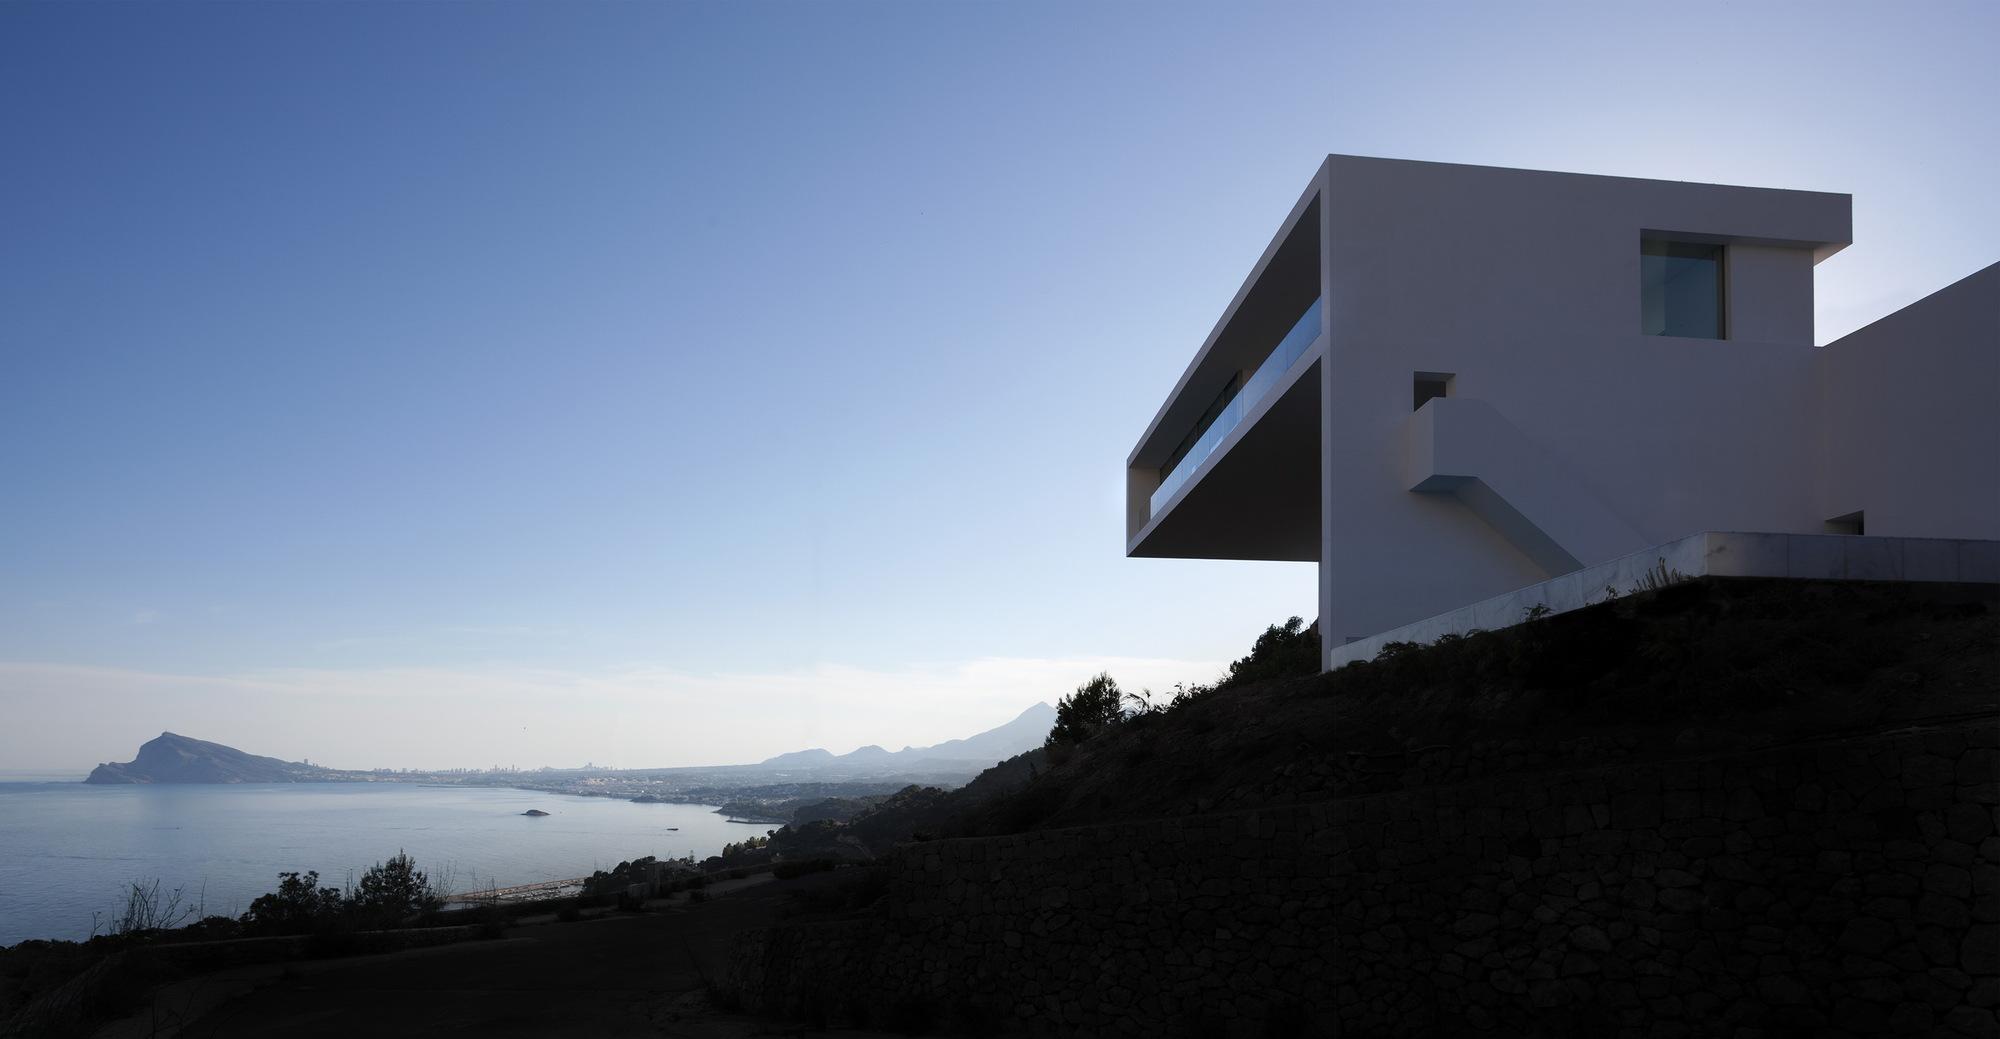 House on the cliff casa del acantilado fran silvestre - Arquitectos en alicante ...